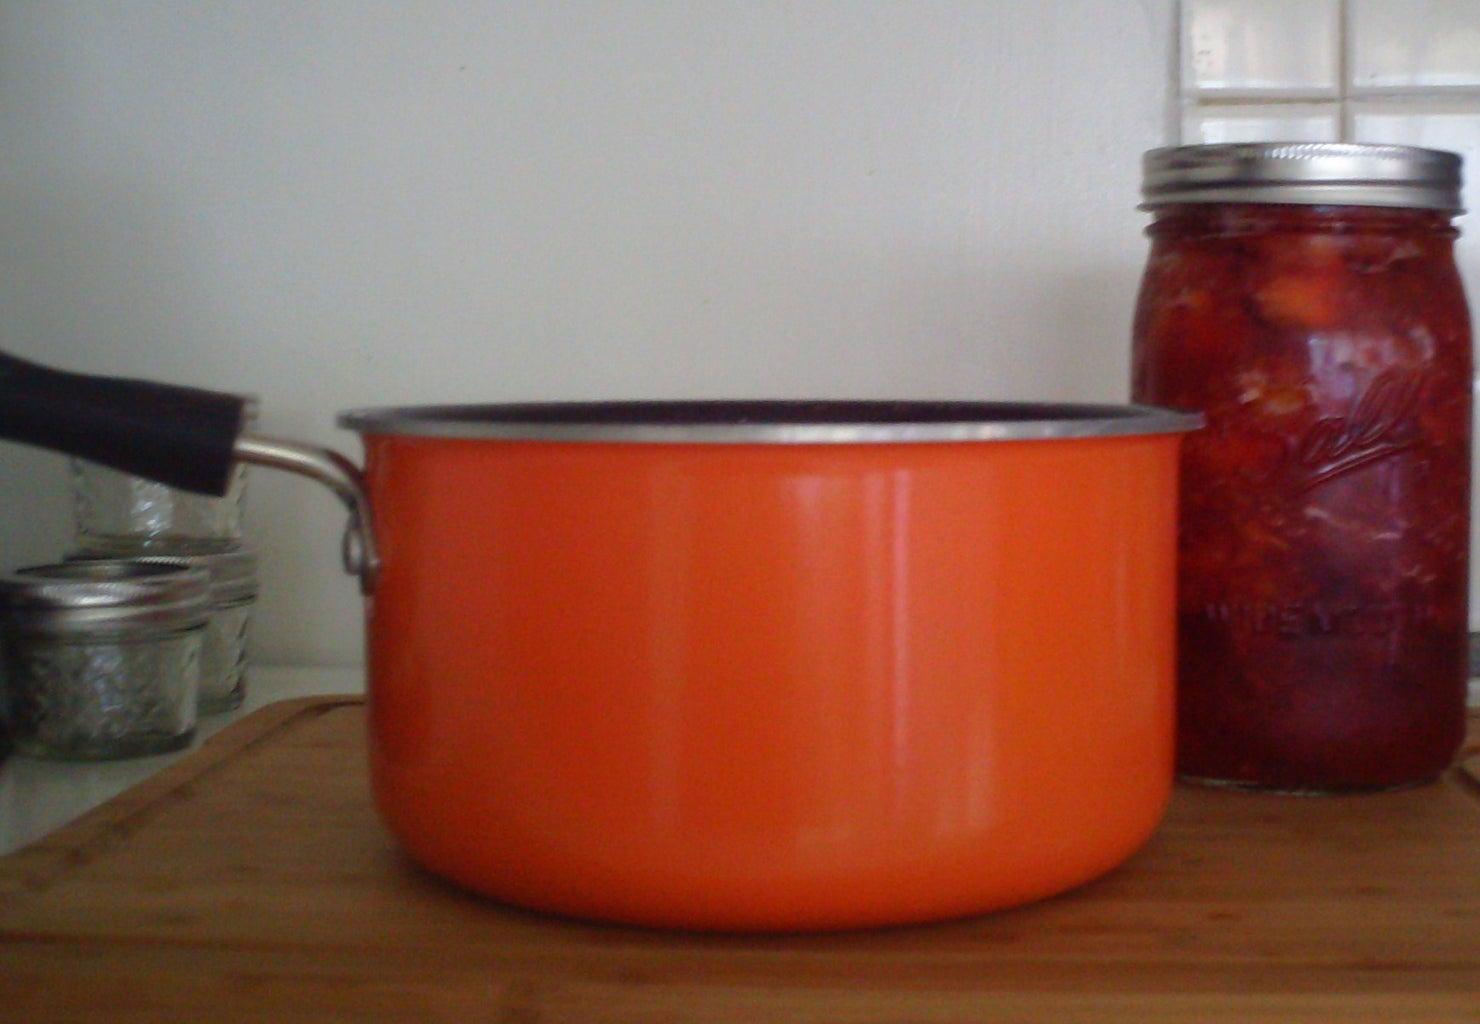 Step 2 Prepare and Make the Jam